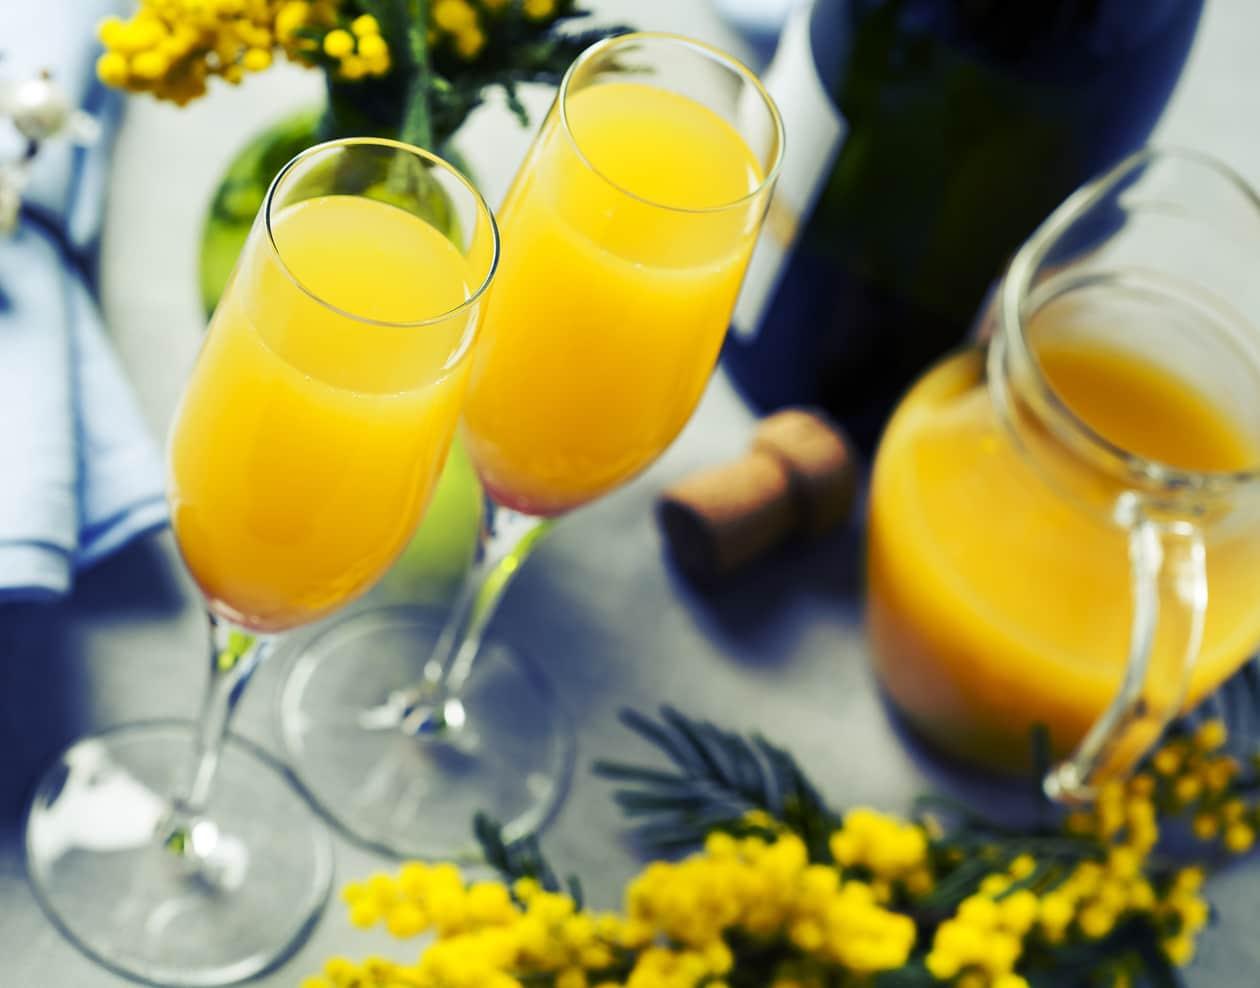 Bottle of champagne and orange juice mimosas